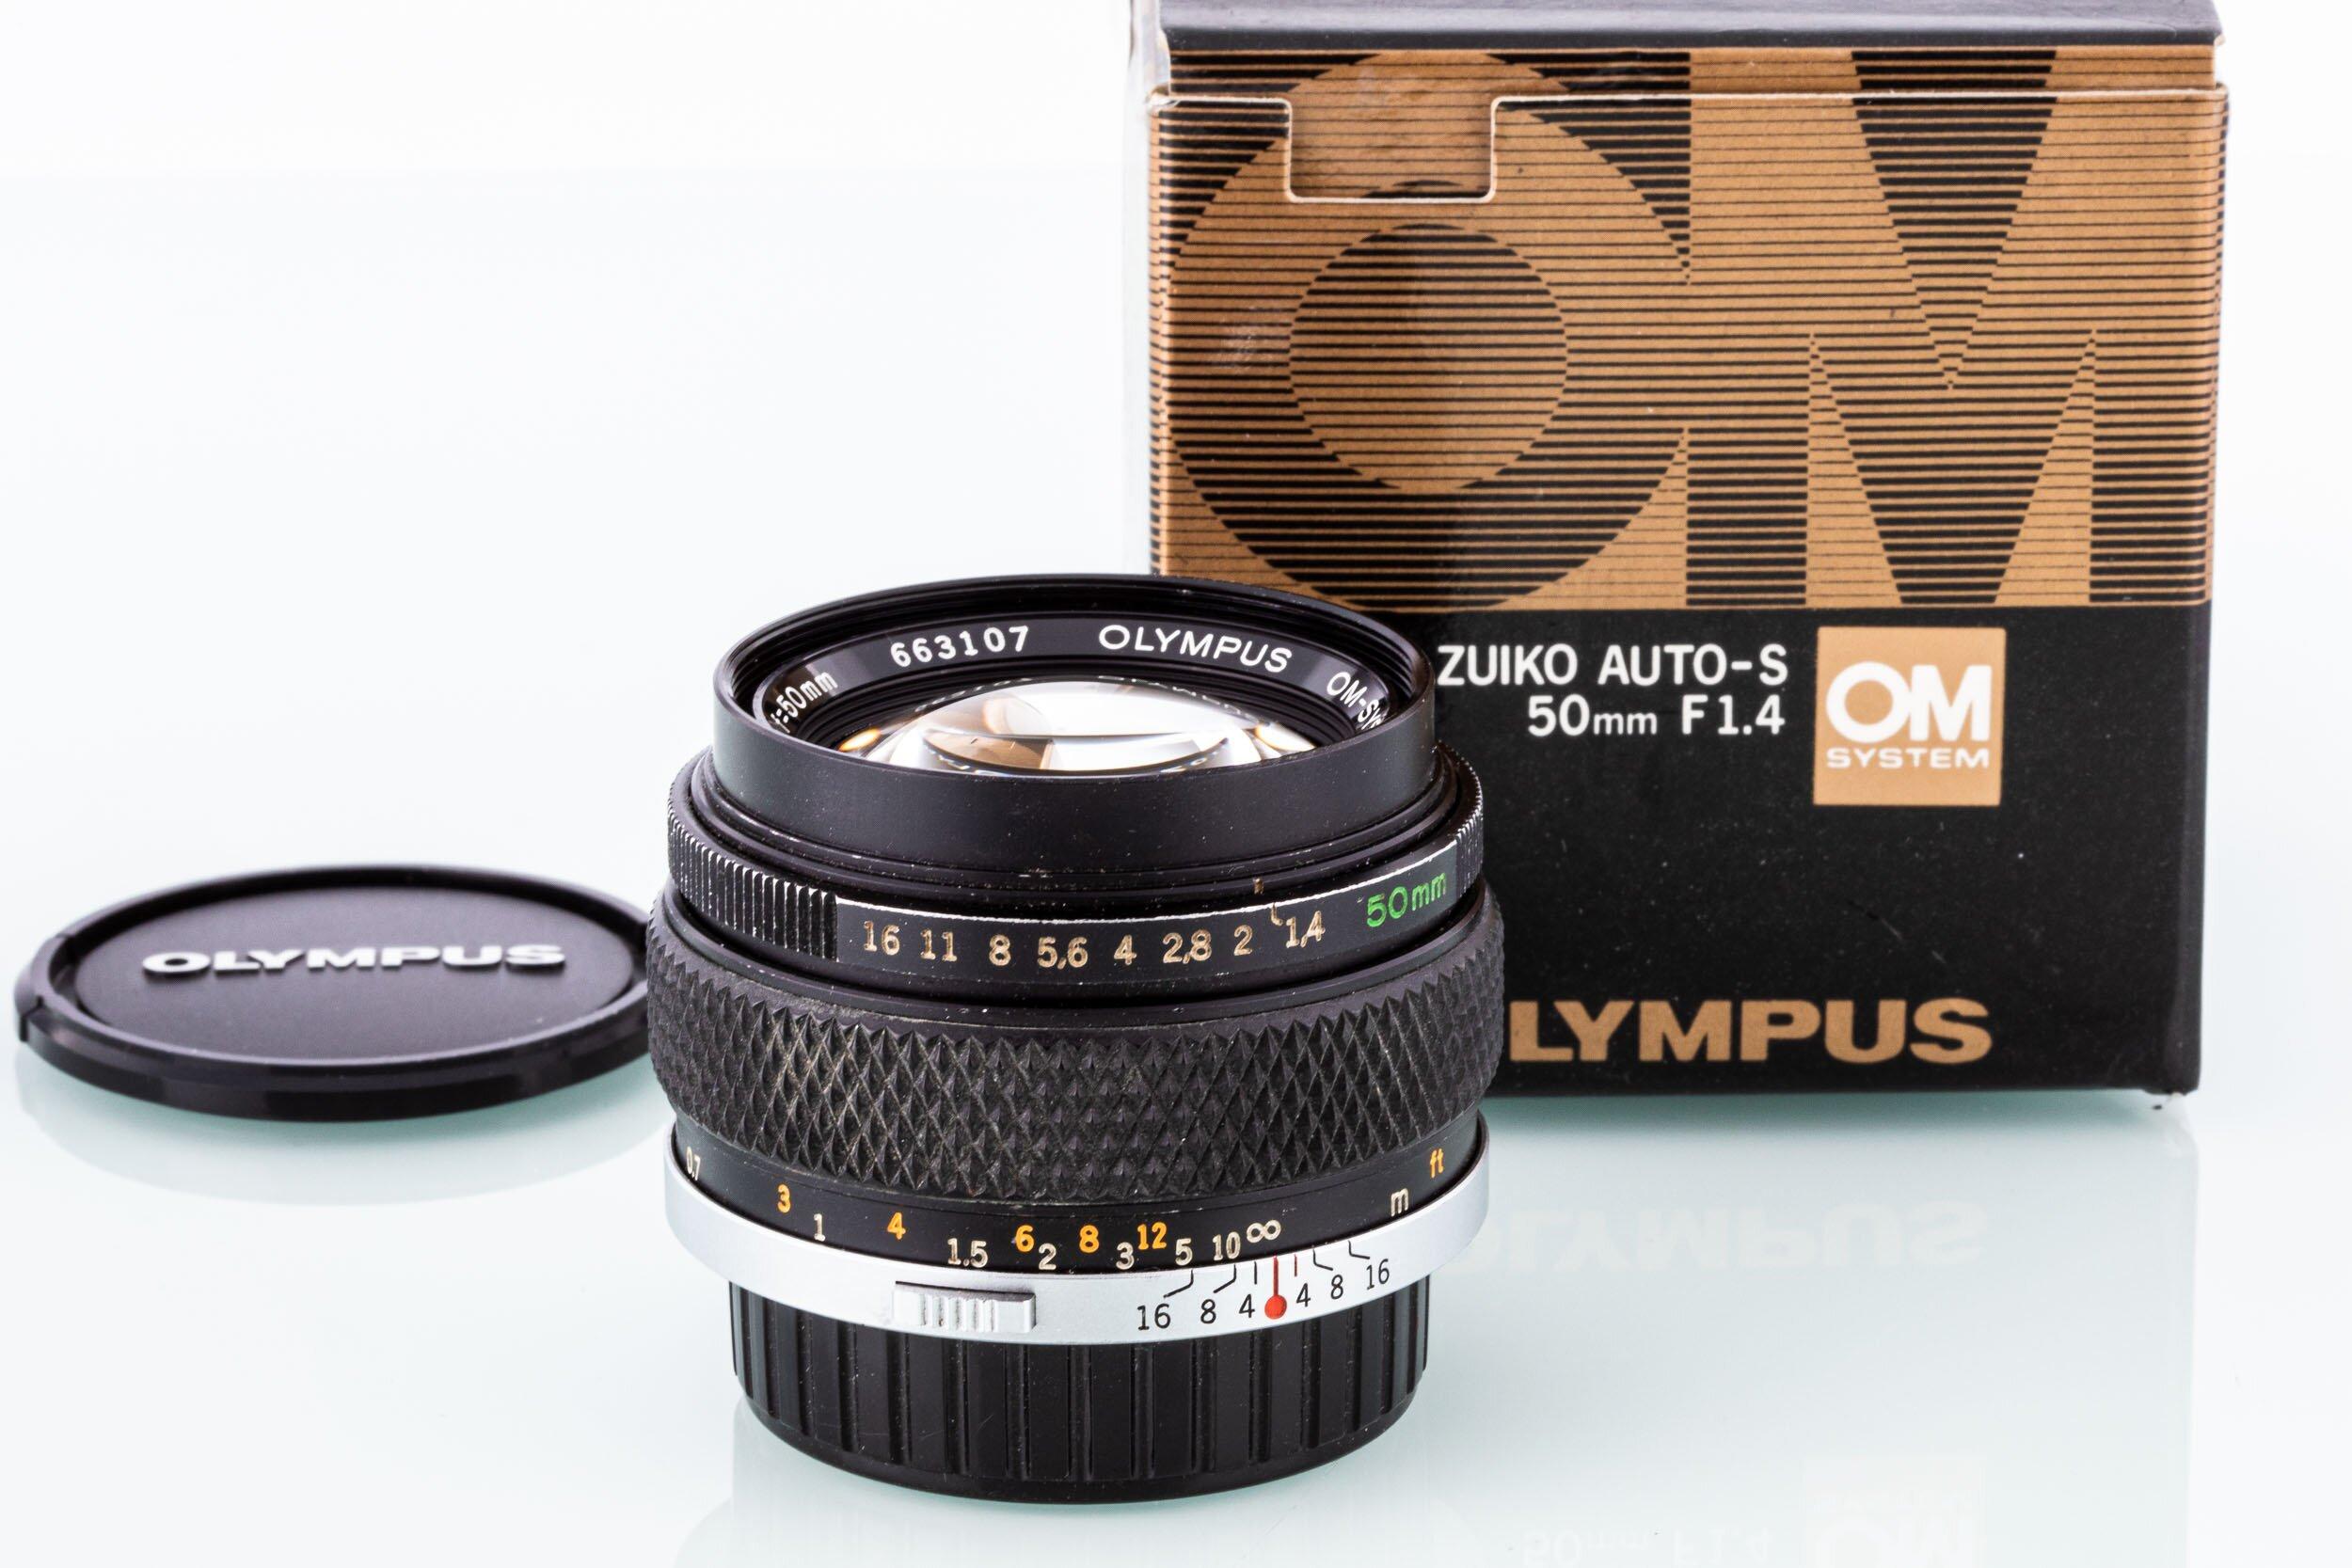 Olympus OM 50mm/1,4 G.Zuiko Auto-S